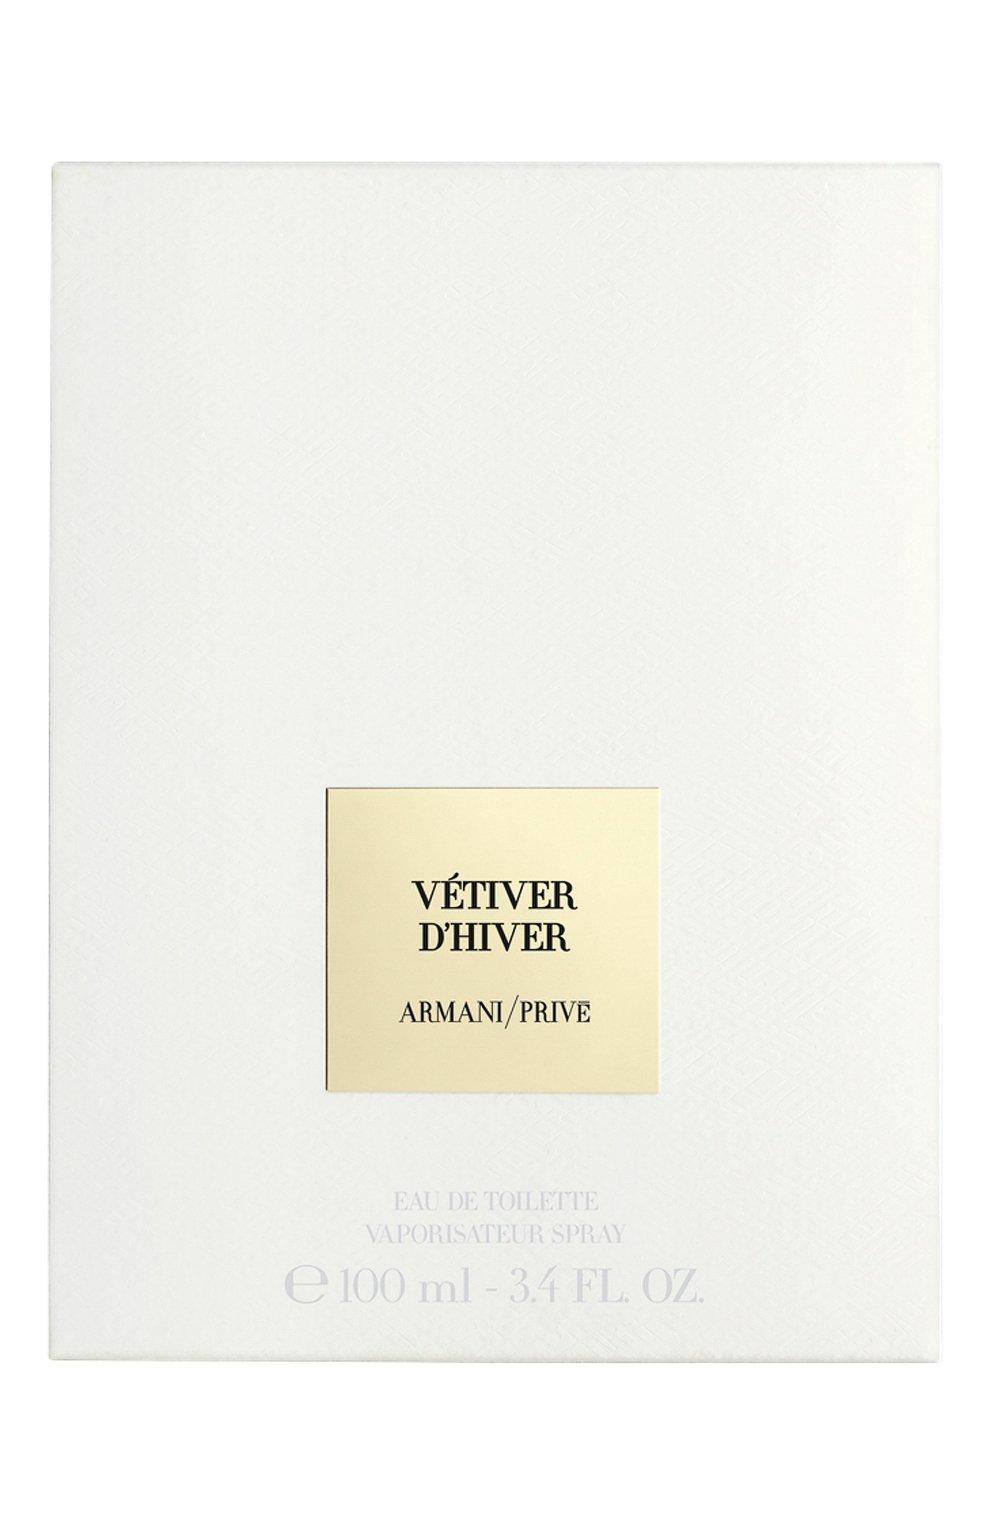 Мужской туалетная вода vetiver d'hiver GIORGIO ARMANI бесцветного цвета, арт. 3614272798694   Фото 2 (Ограничения доставки: flammable)